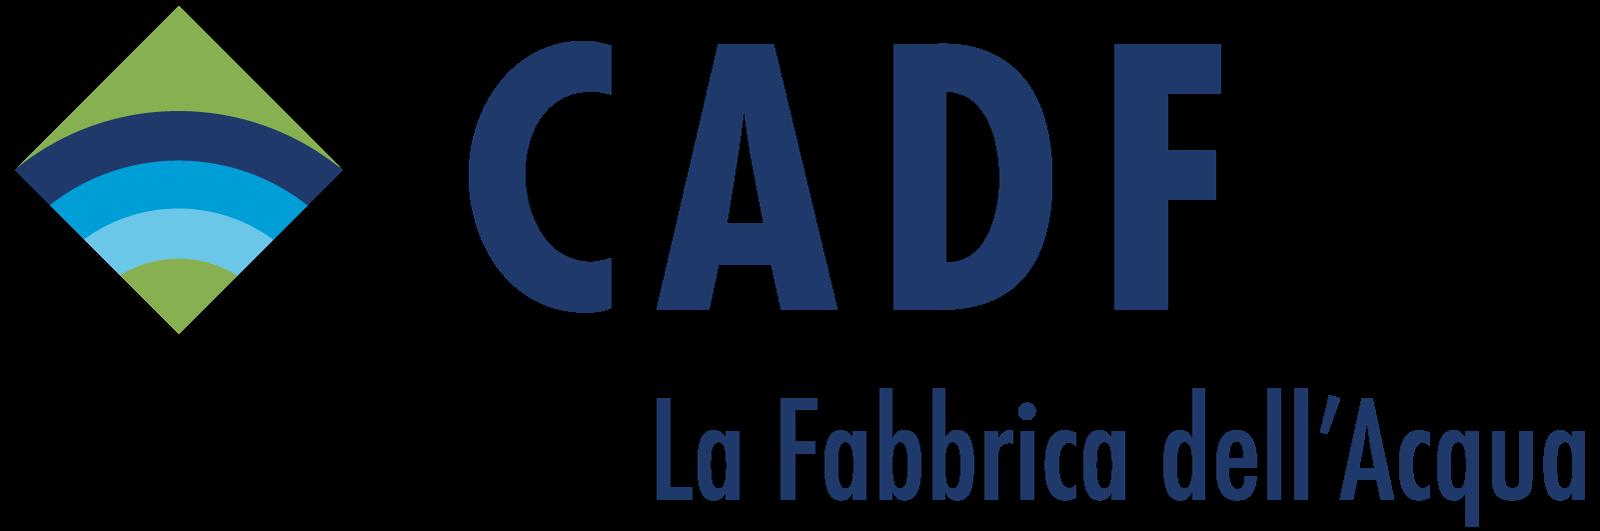 Variazione di orario di apertura dei depuratori CADF